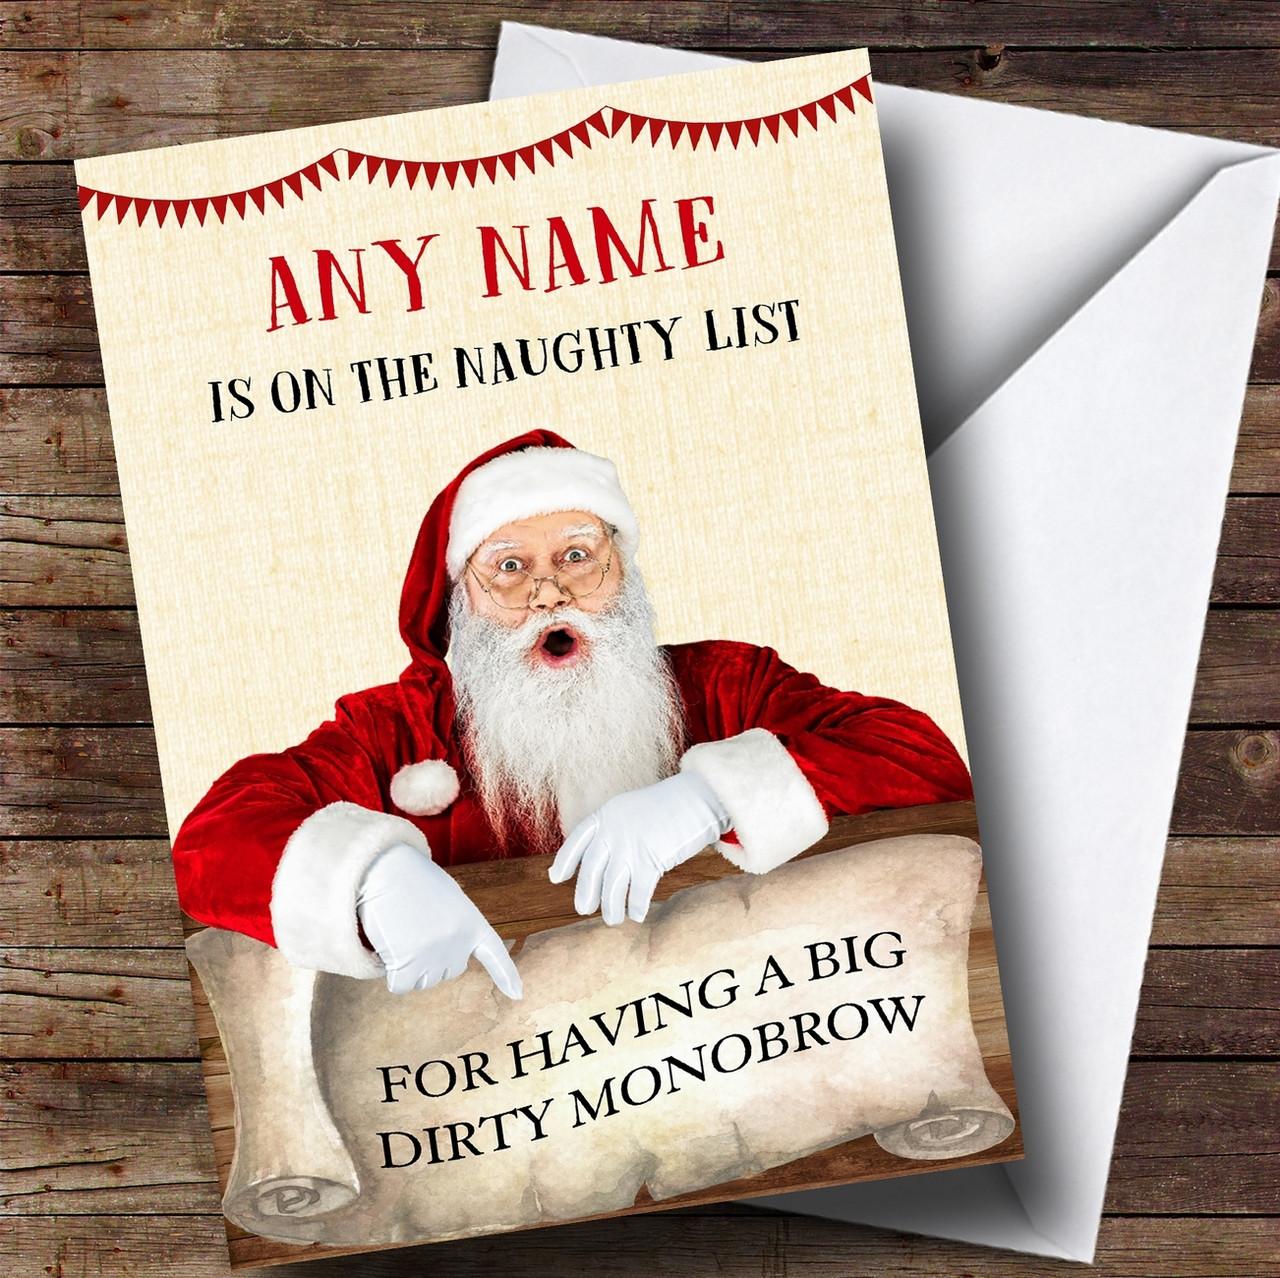 Funny rude offensive naughty list monobrow personalised christmas funny rude offensive naughty list monobrow personalised christmas card m4hsunfo